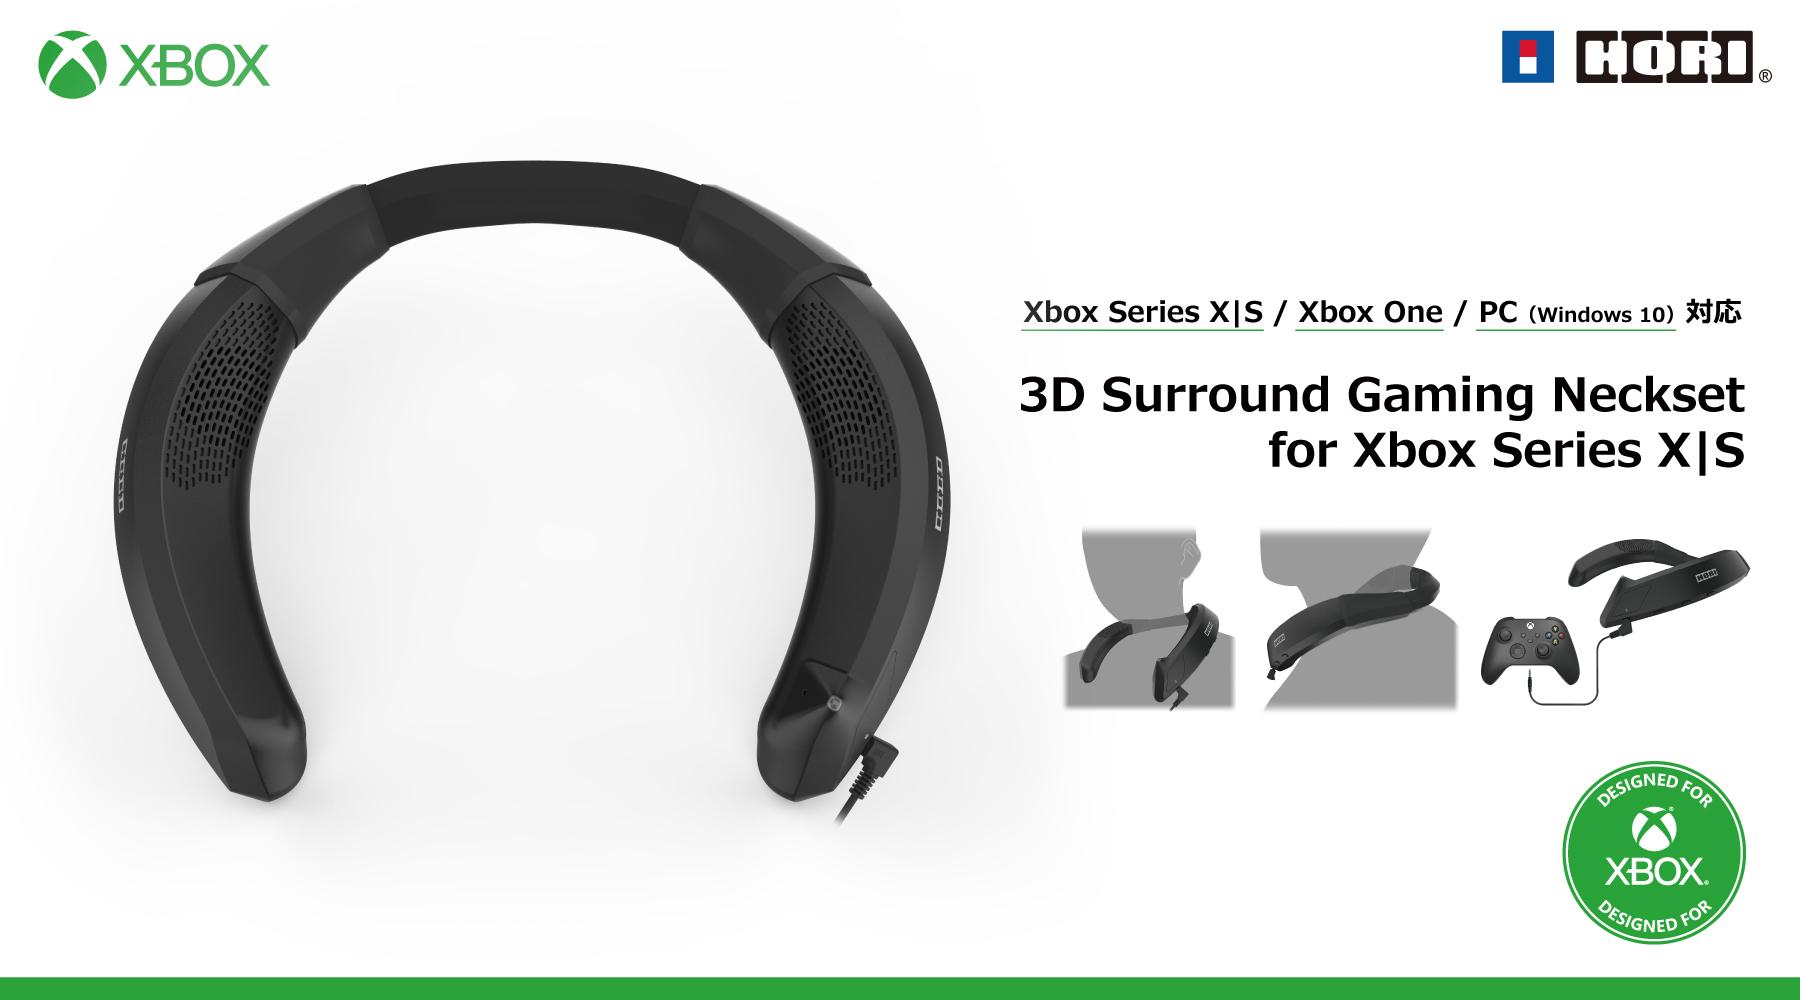 3D Surround Gaming Neckset for Xbox Series X S が2021年9月30日に発売!